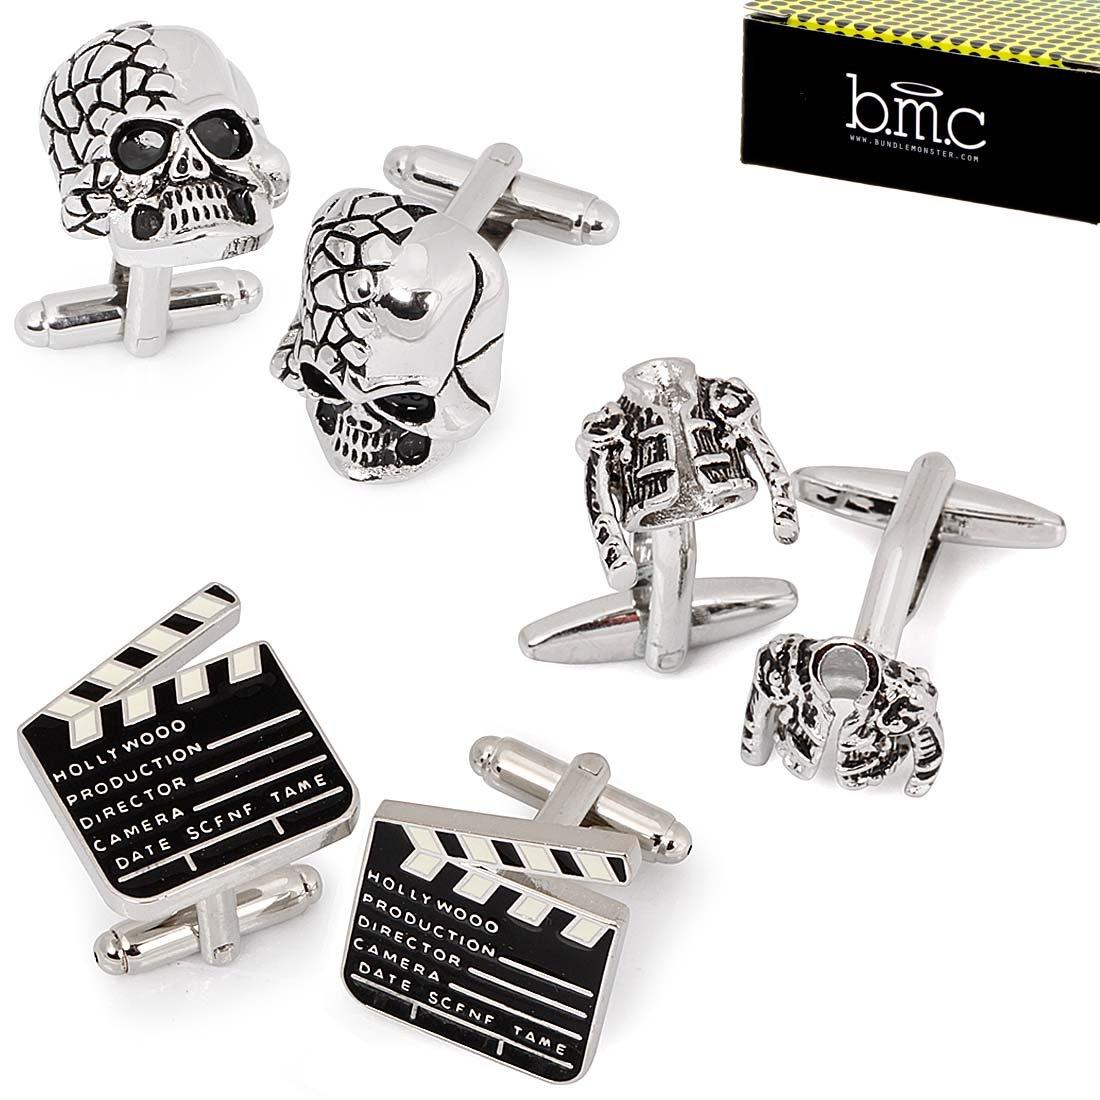 BMC 3 Pair Trendy Silver Colored Mens Cufflinks Set - Pop Star Jackets Skulls Movie Markers by b.m.c (Image #1)